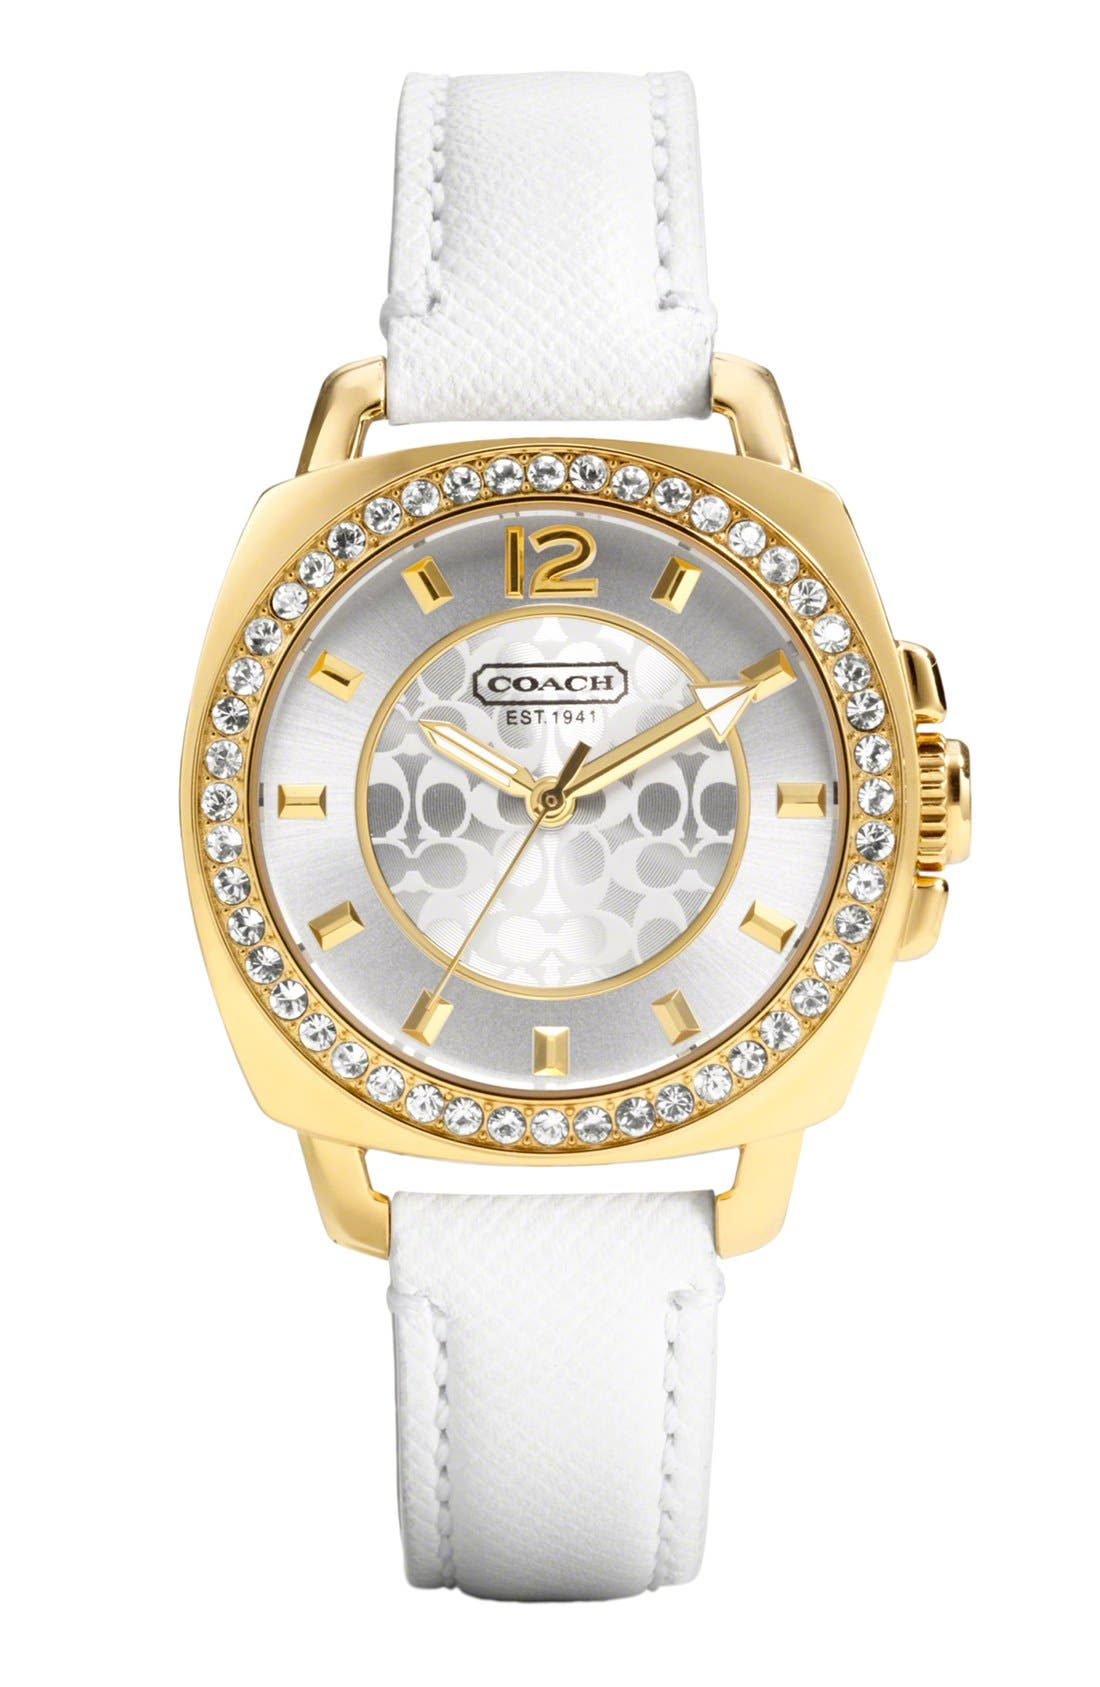 Alternate Image 1 Selected - COACH 'Boyfriend' Crystal Bezel Leather Strap Watch, 40mm